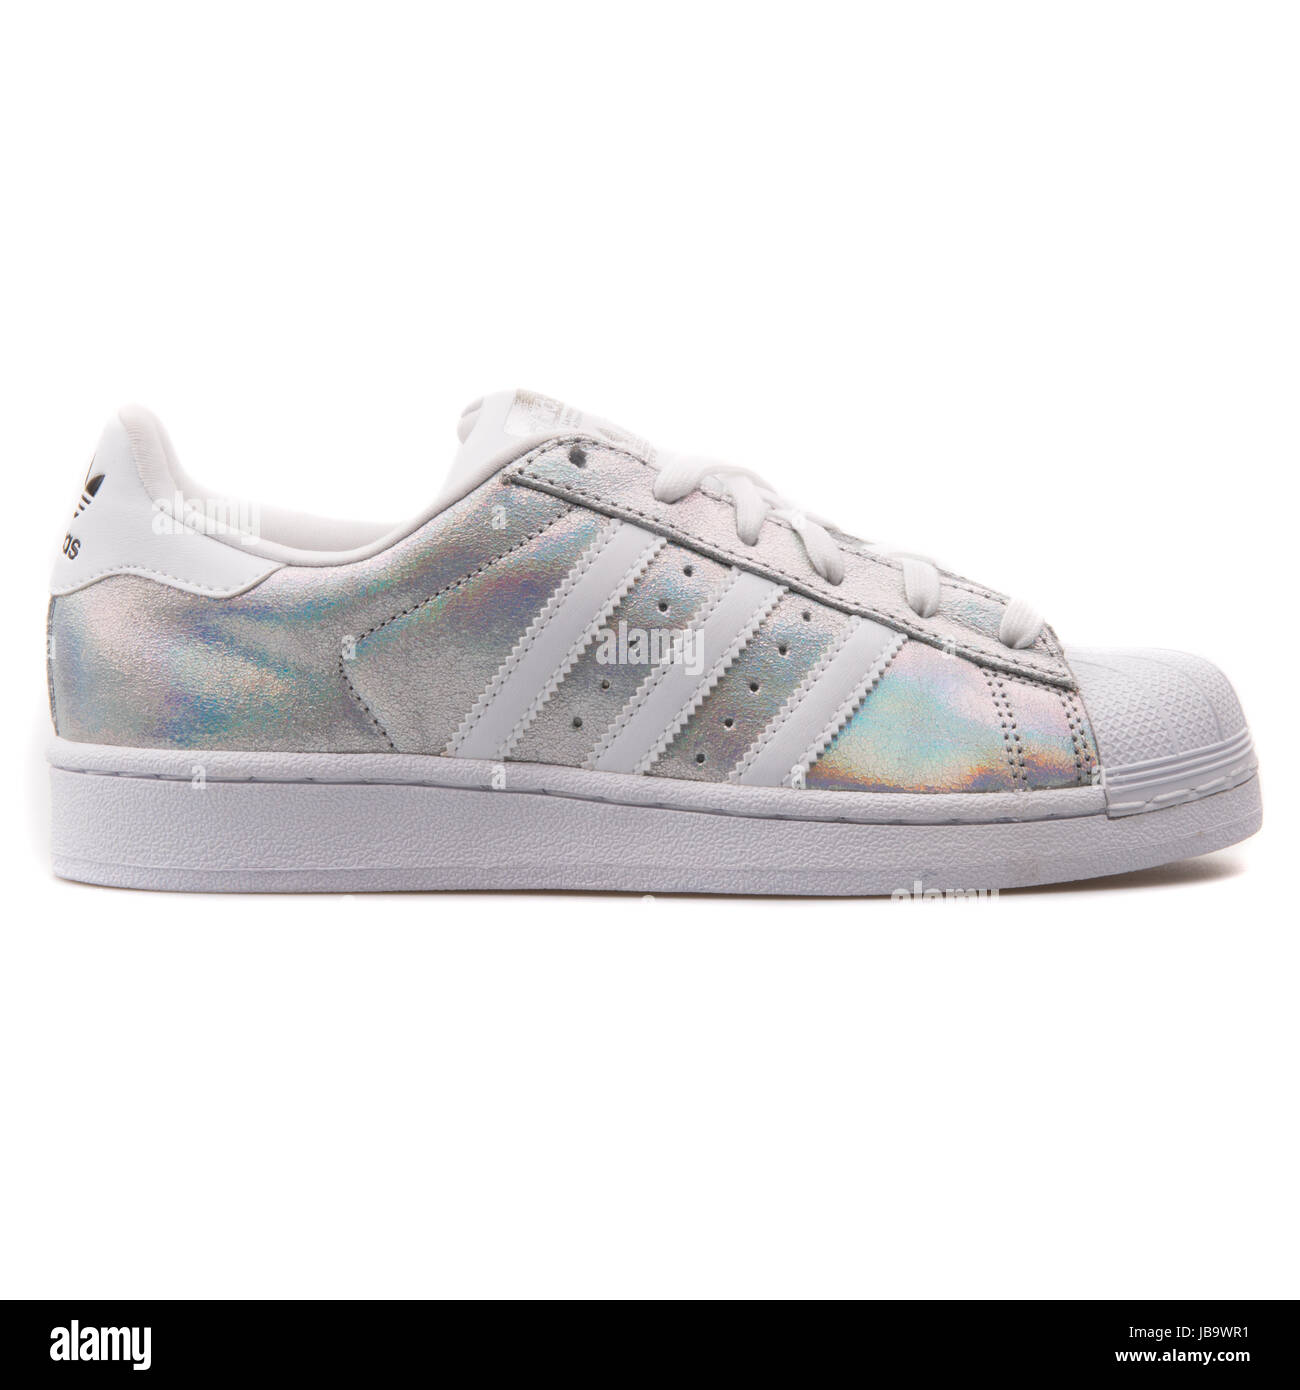 adidas originals superstar w hologram iridescent womens shoes sneakers s81644